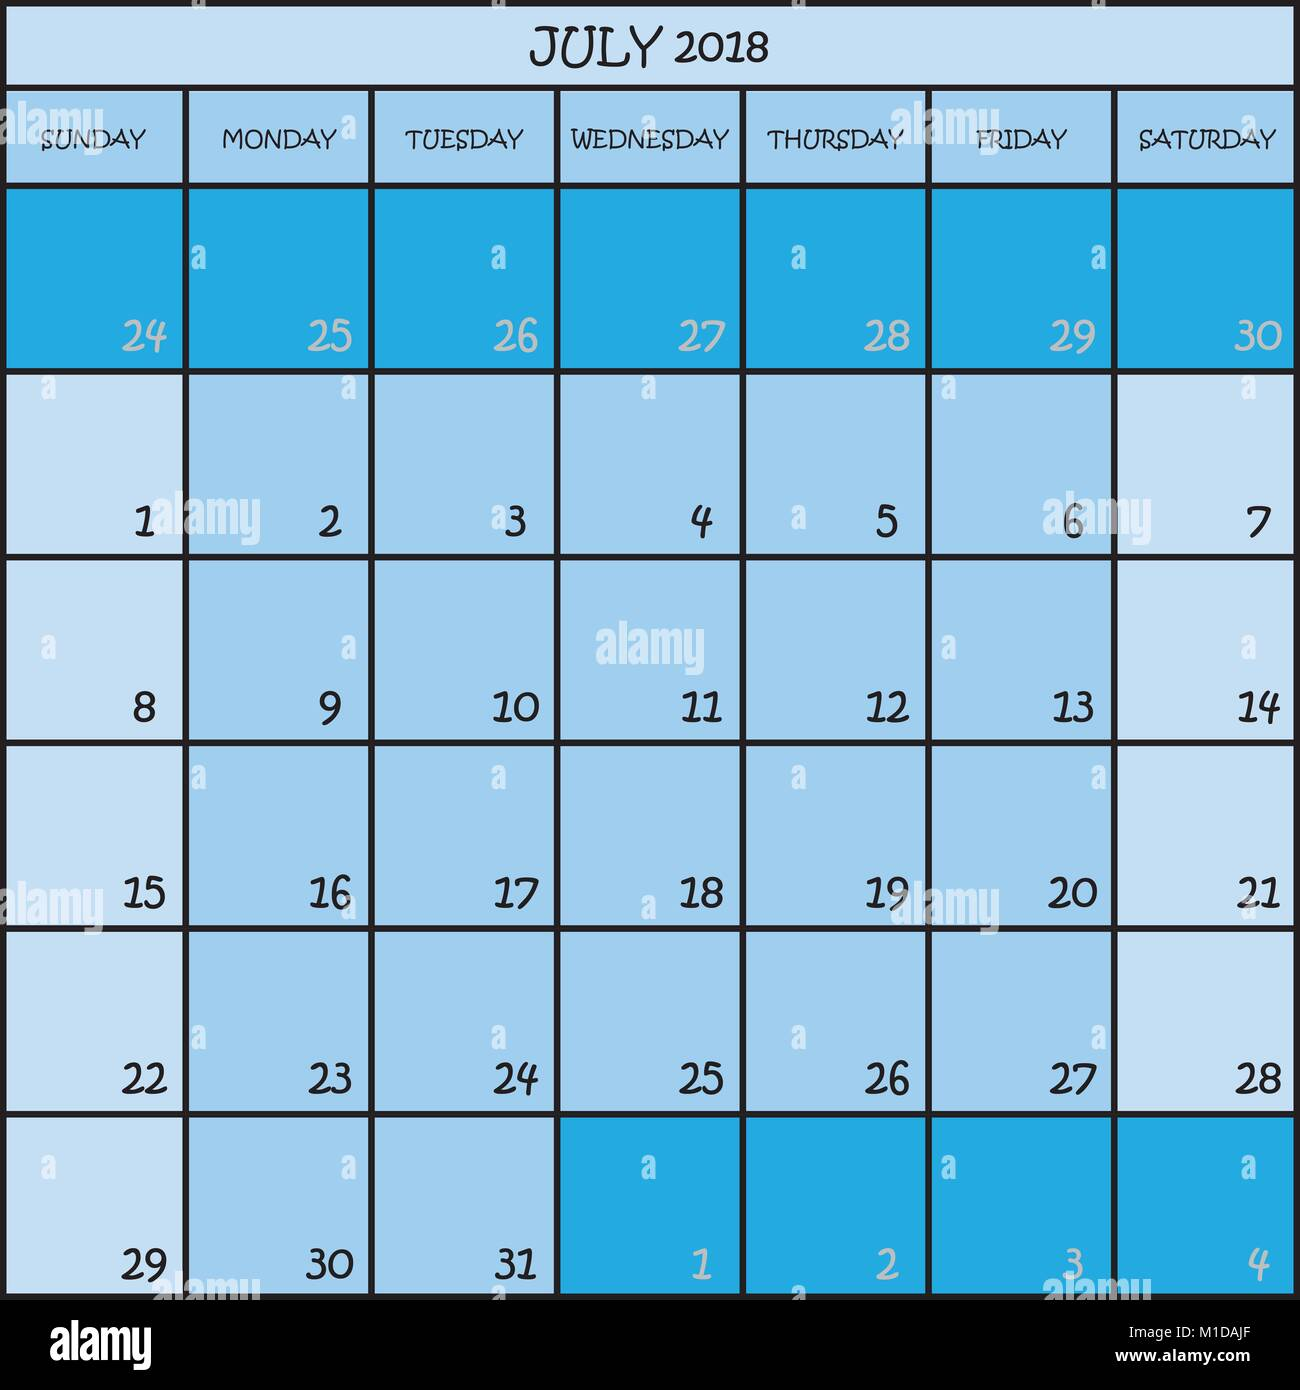 Calendario Mes De Julio.Planificador De Calendario Mes De Julio De 2018 En Tres Tonos De